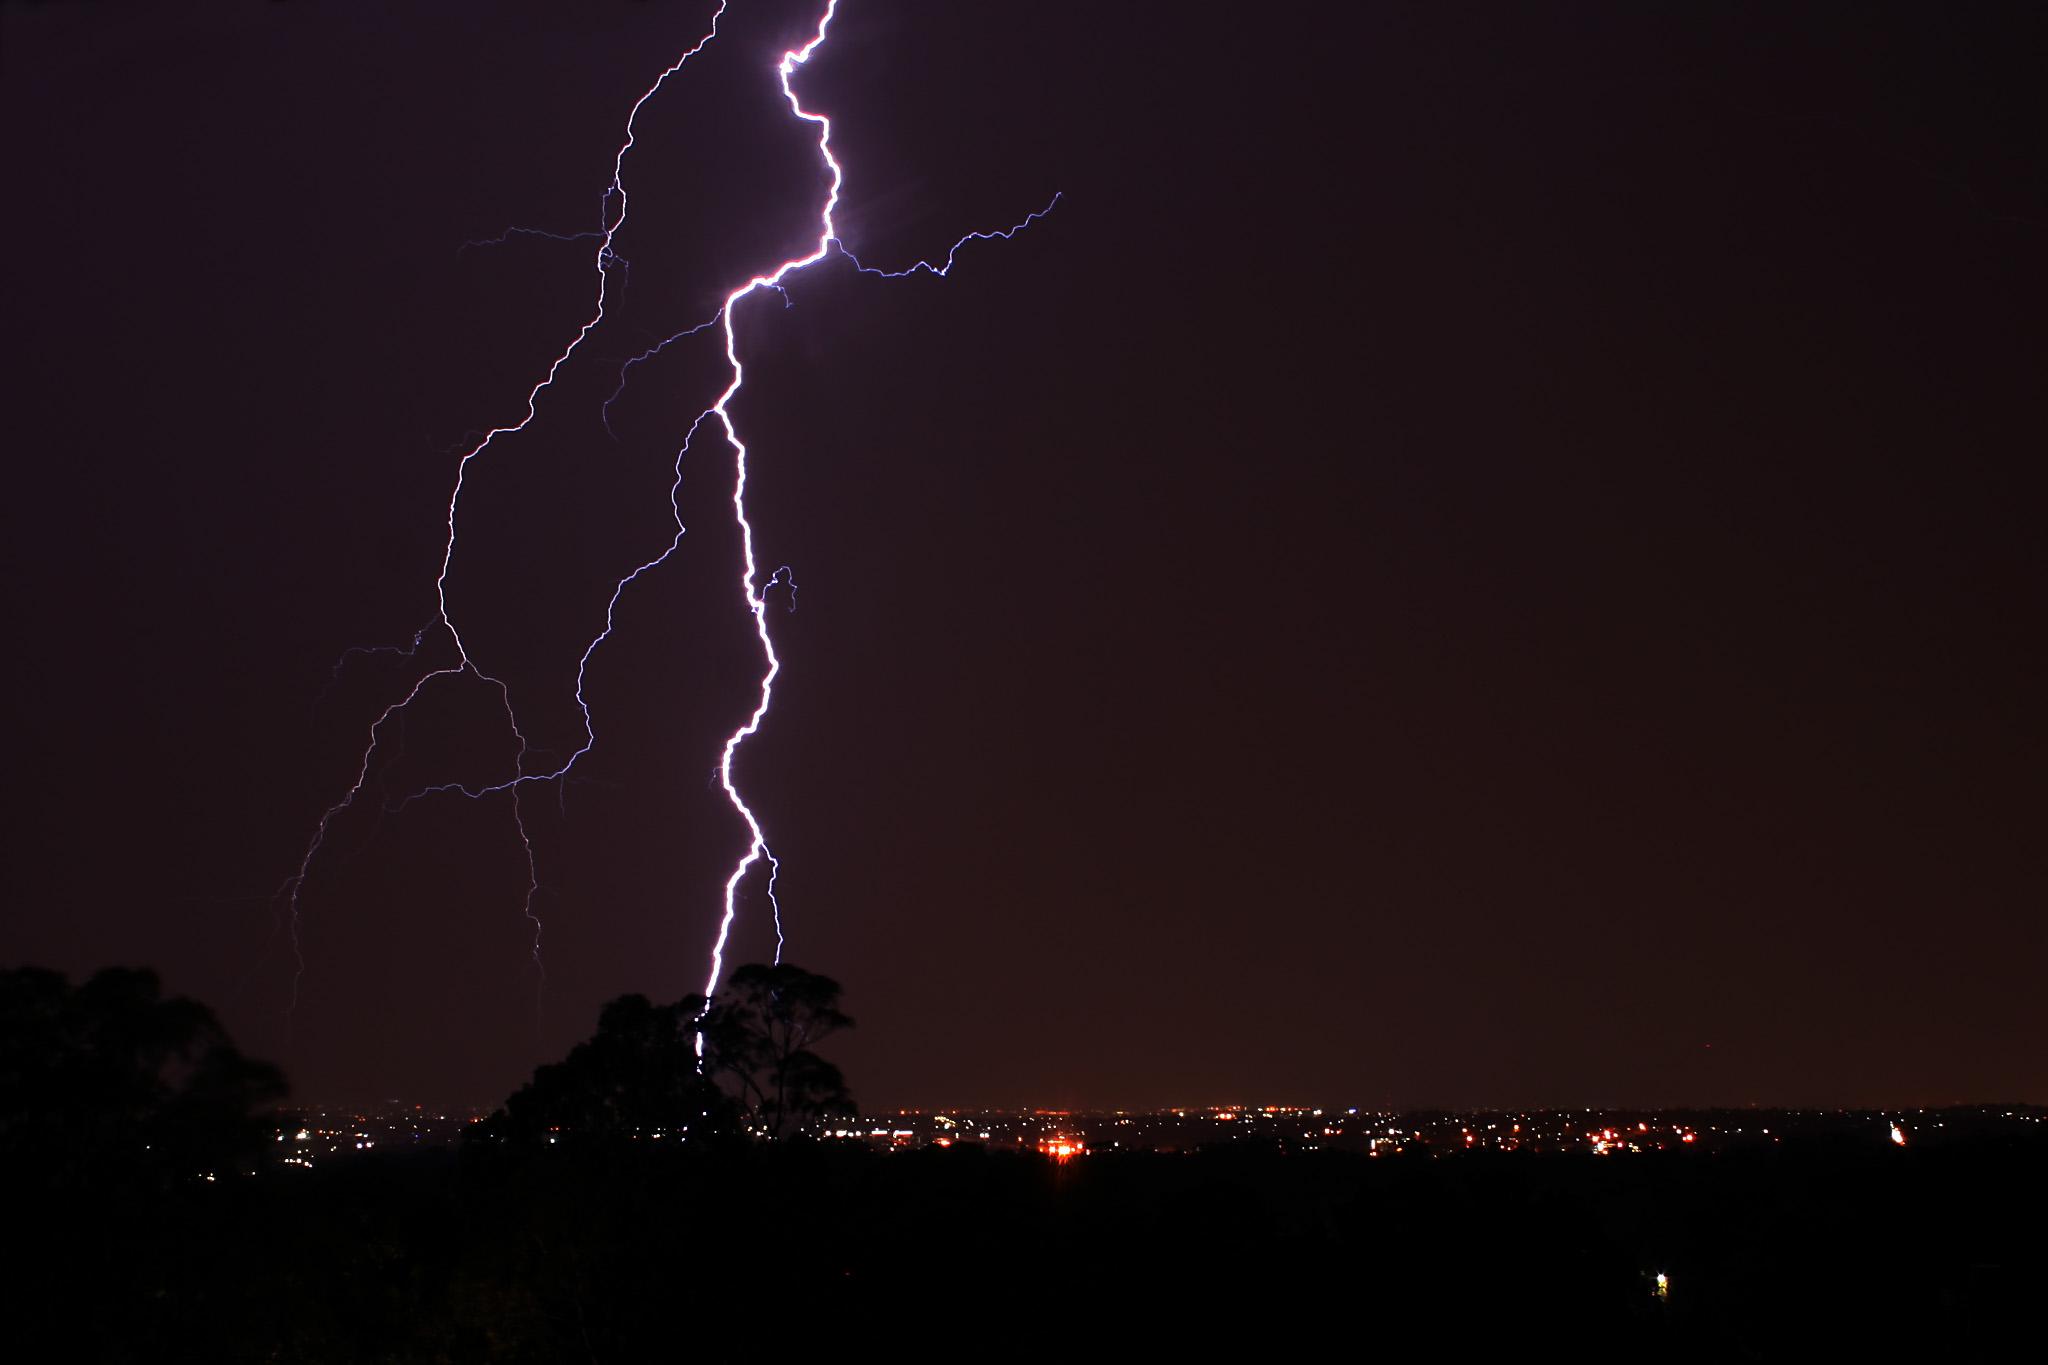 Climate Strike Wikipedia: File:Lightning 3025.jpg